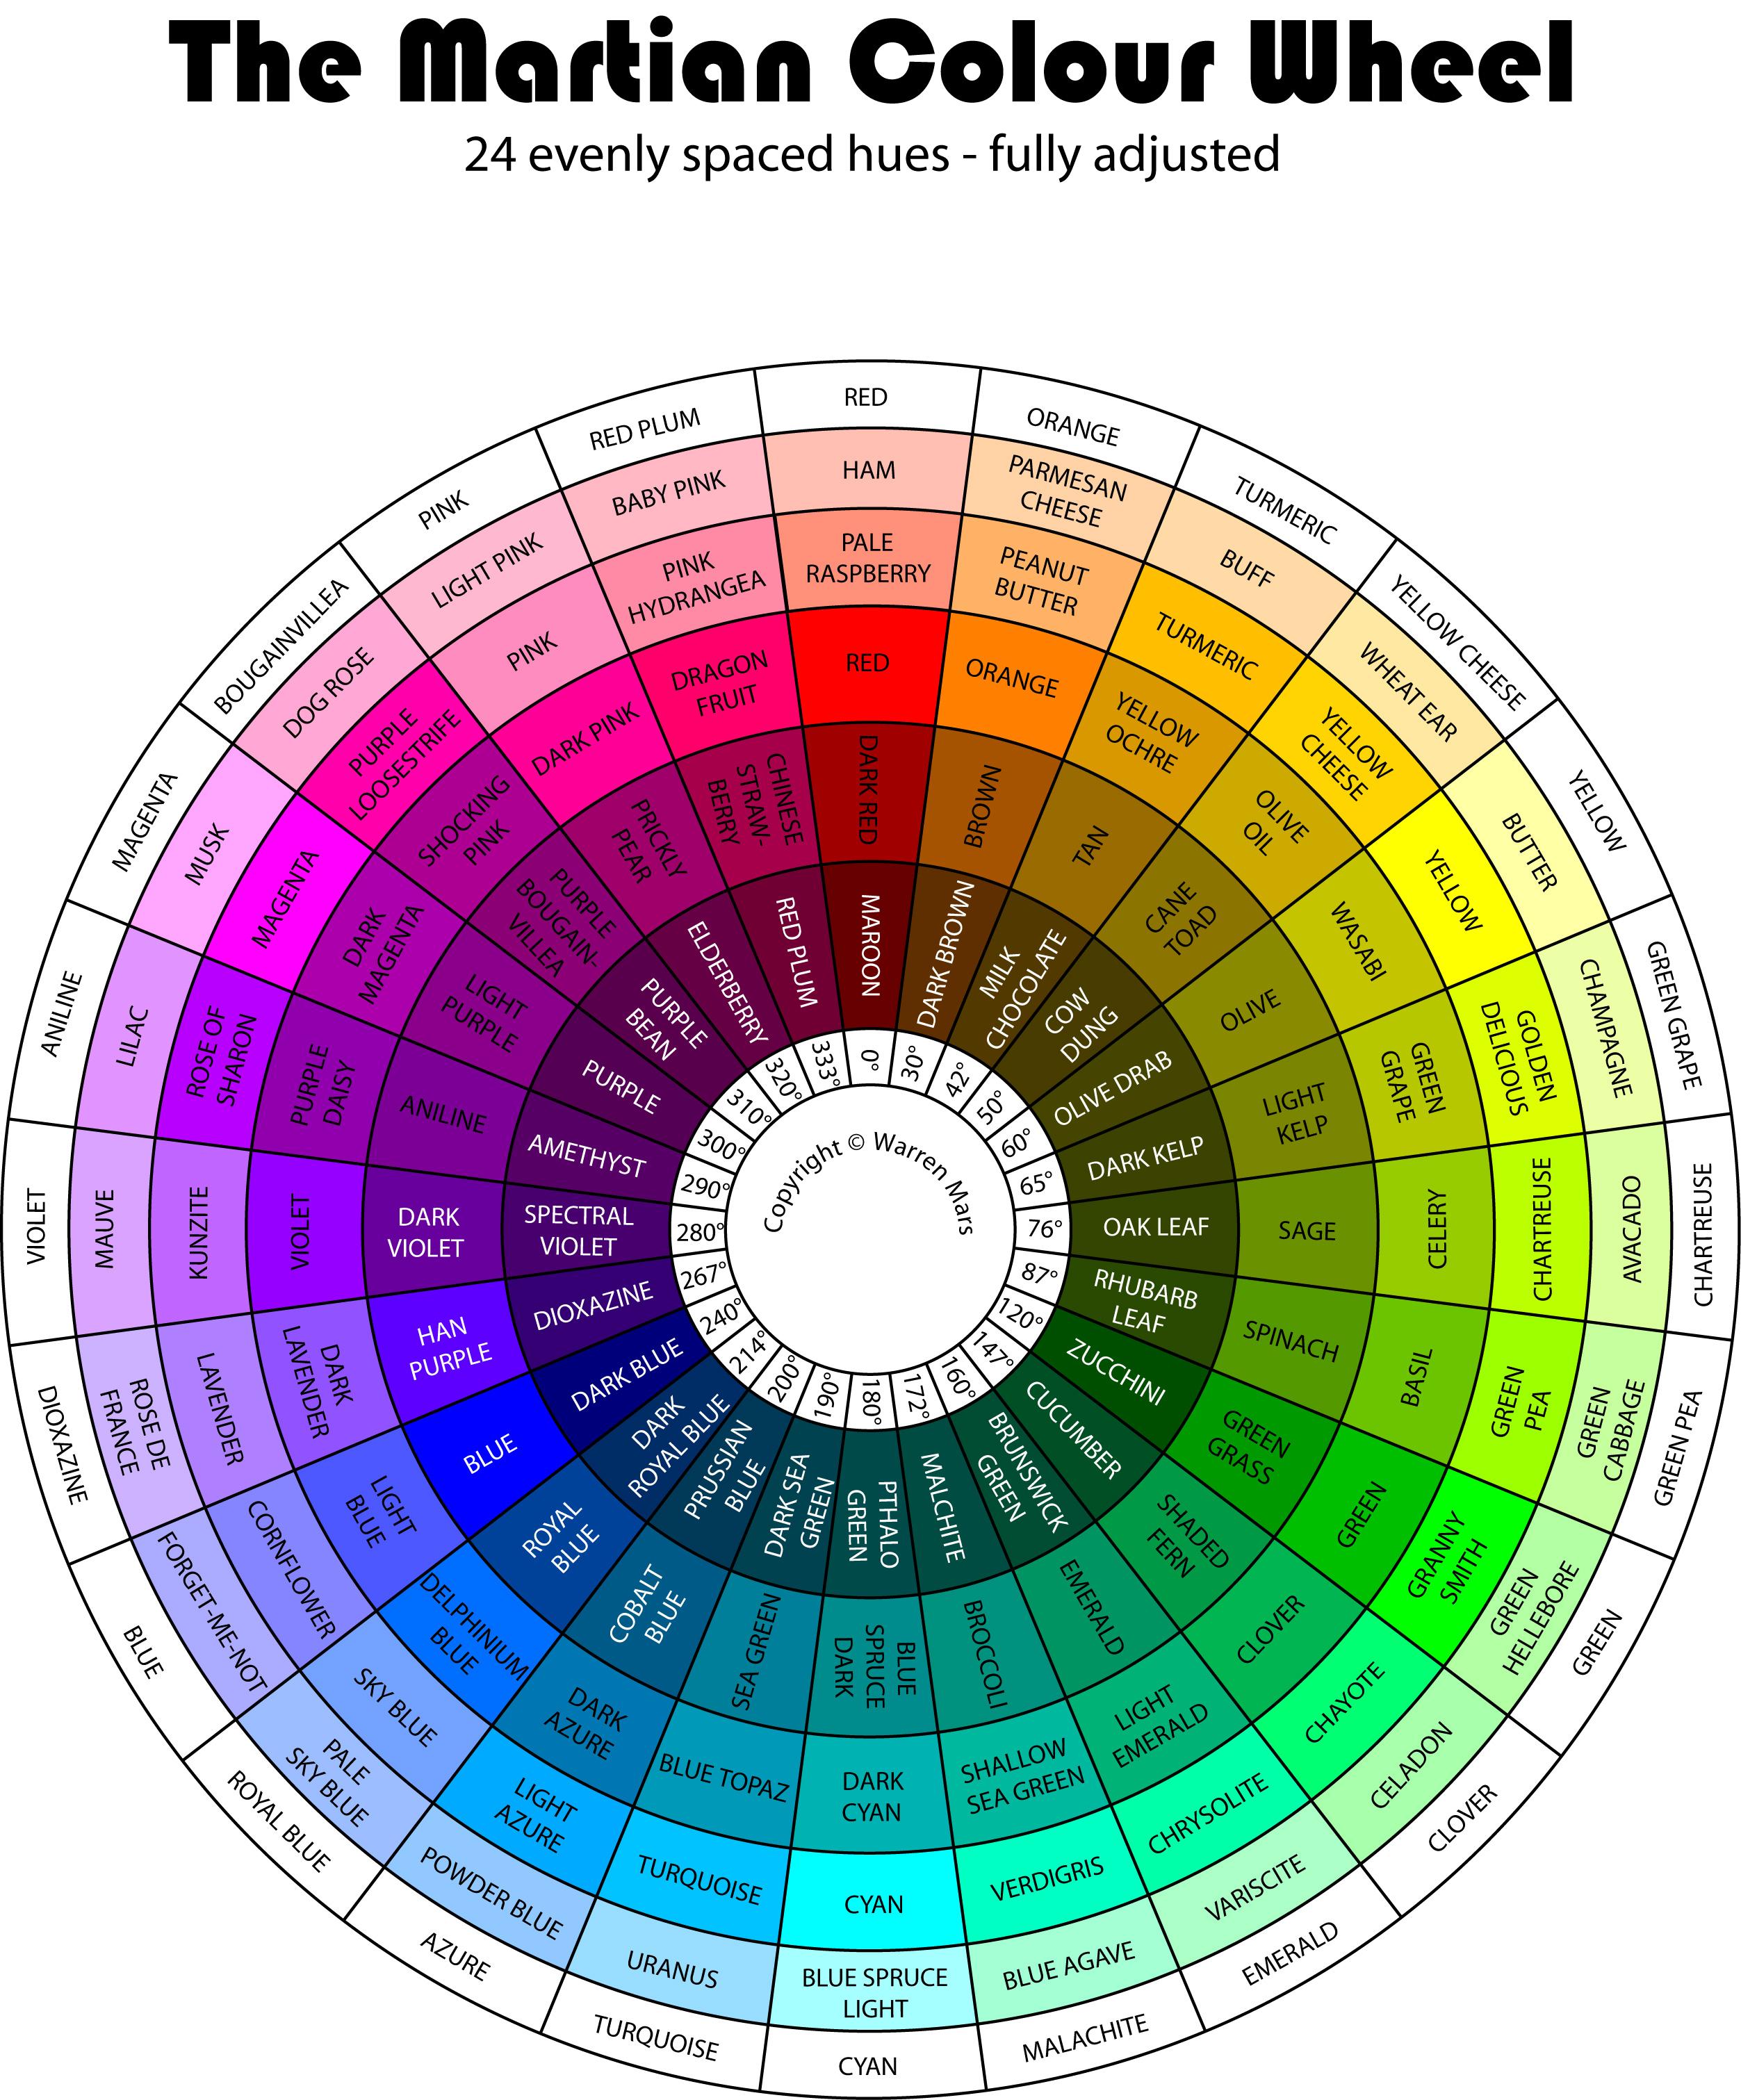 Color chart rainbow - The Martian Colour Wheel See Last Sentence